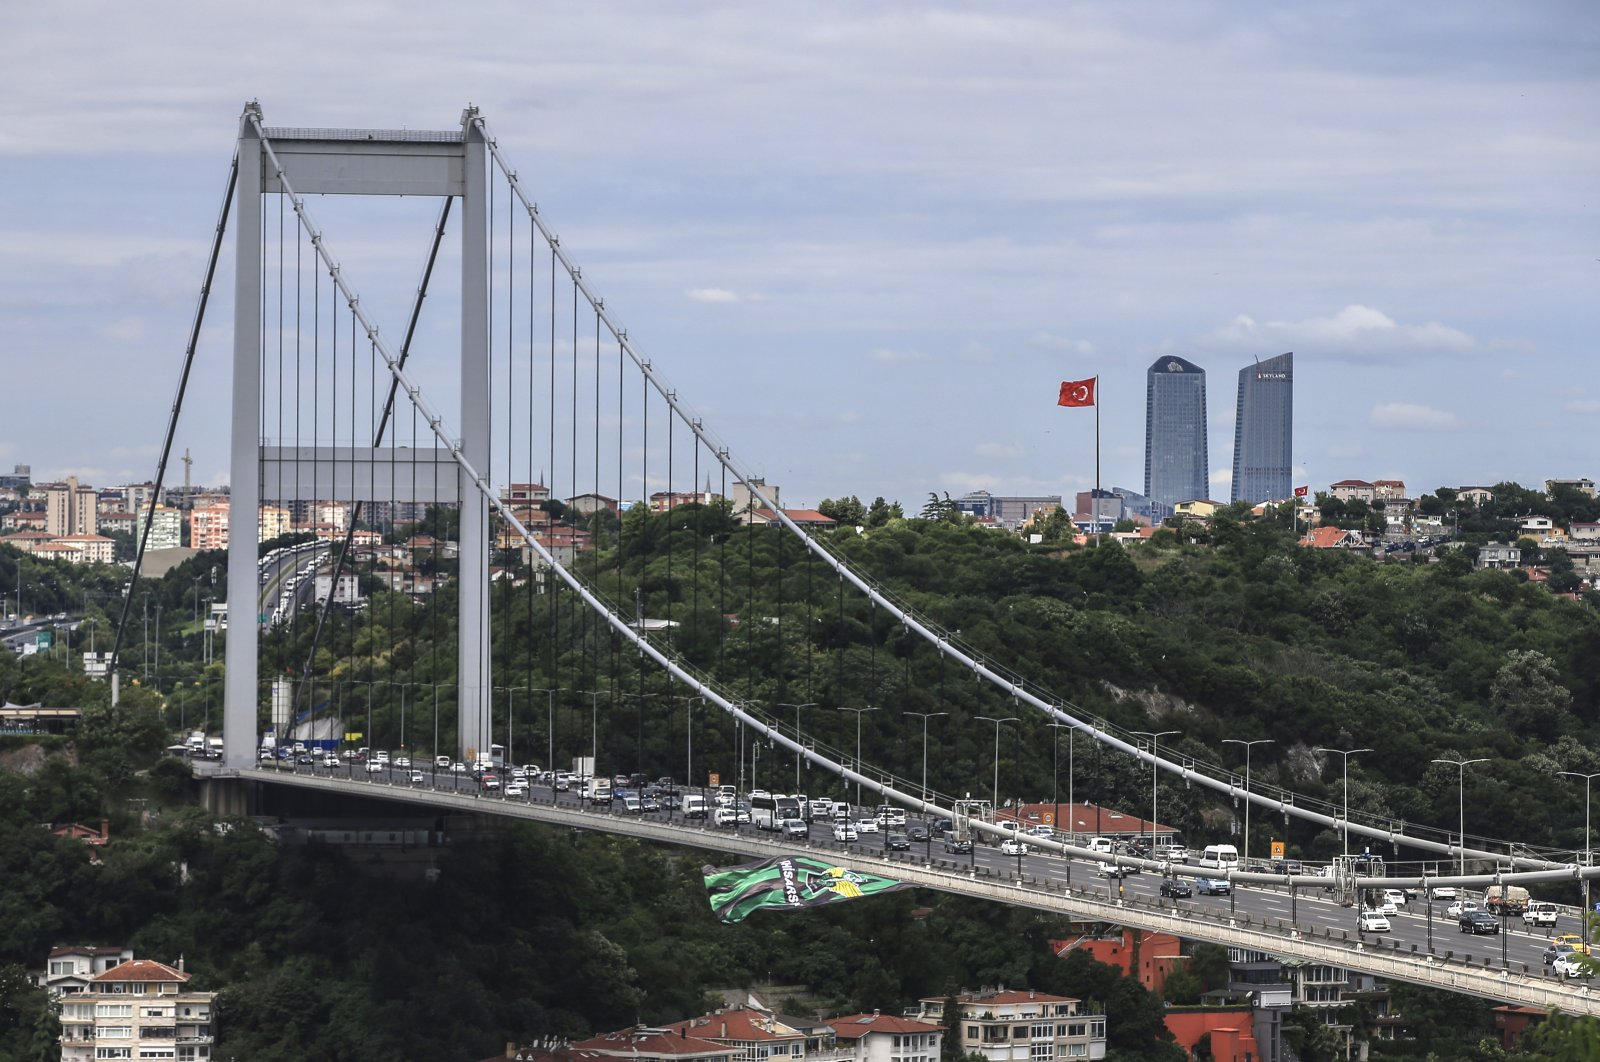 Traffic crosses the Fatih Sultan Mehmet Bridge over the Bosporus Strait, separating Asia and Europe in Istanbul, Turkey, June 25, 2018. (AP Photo)